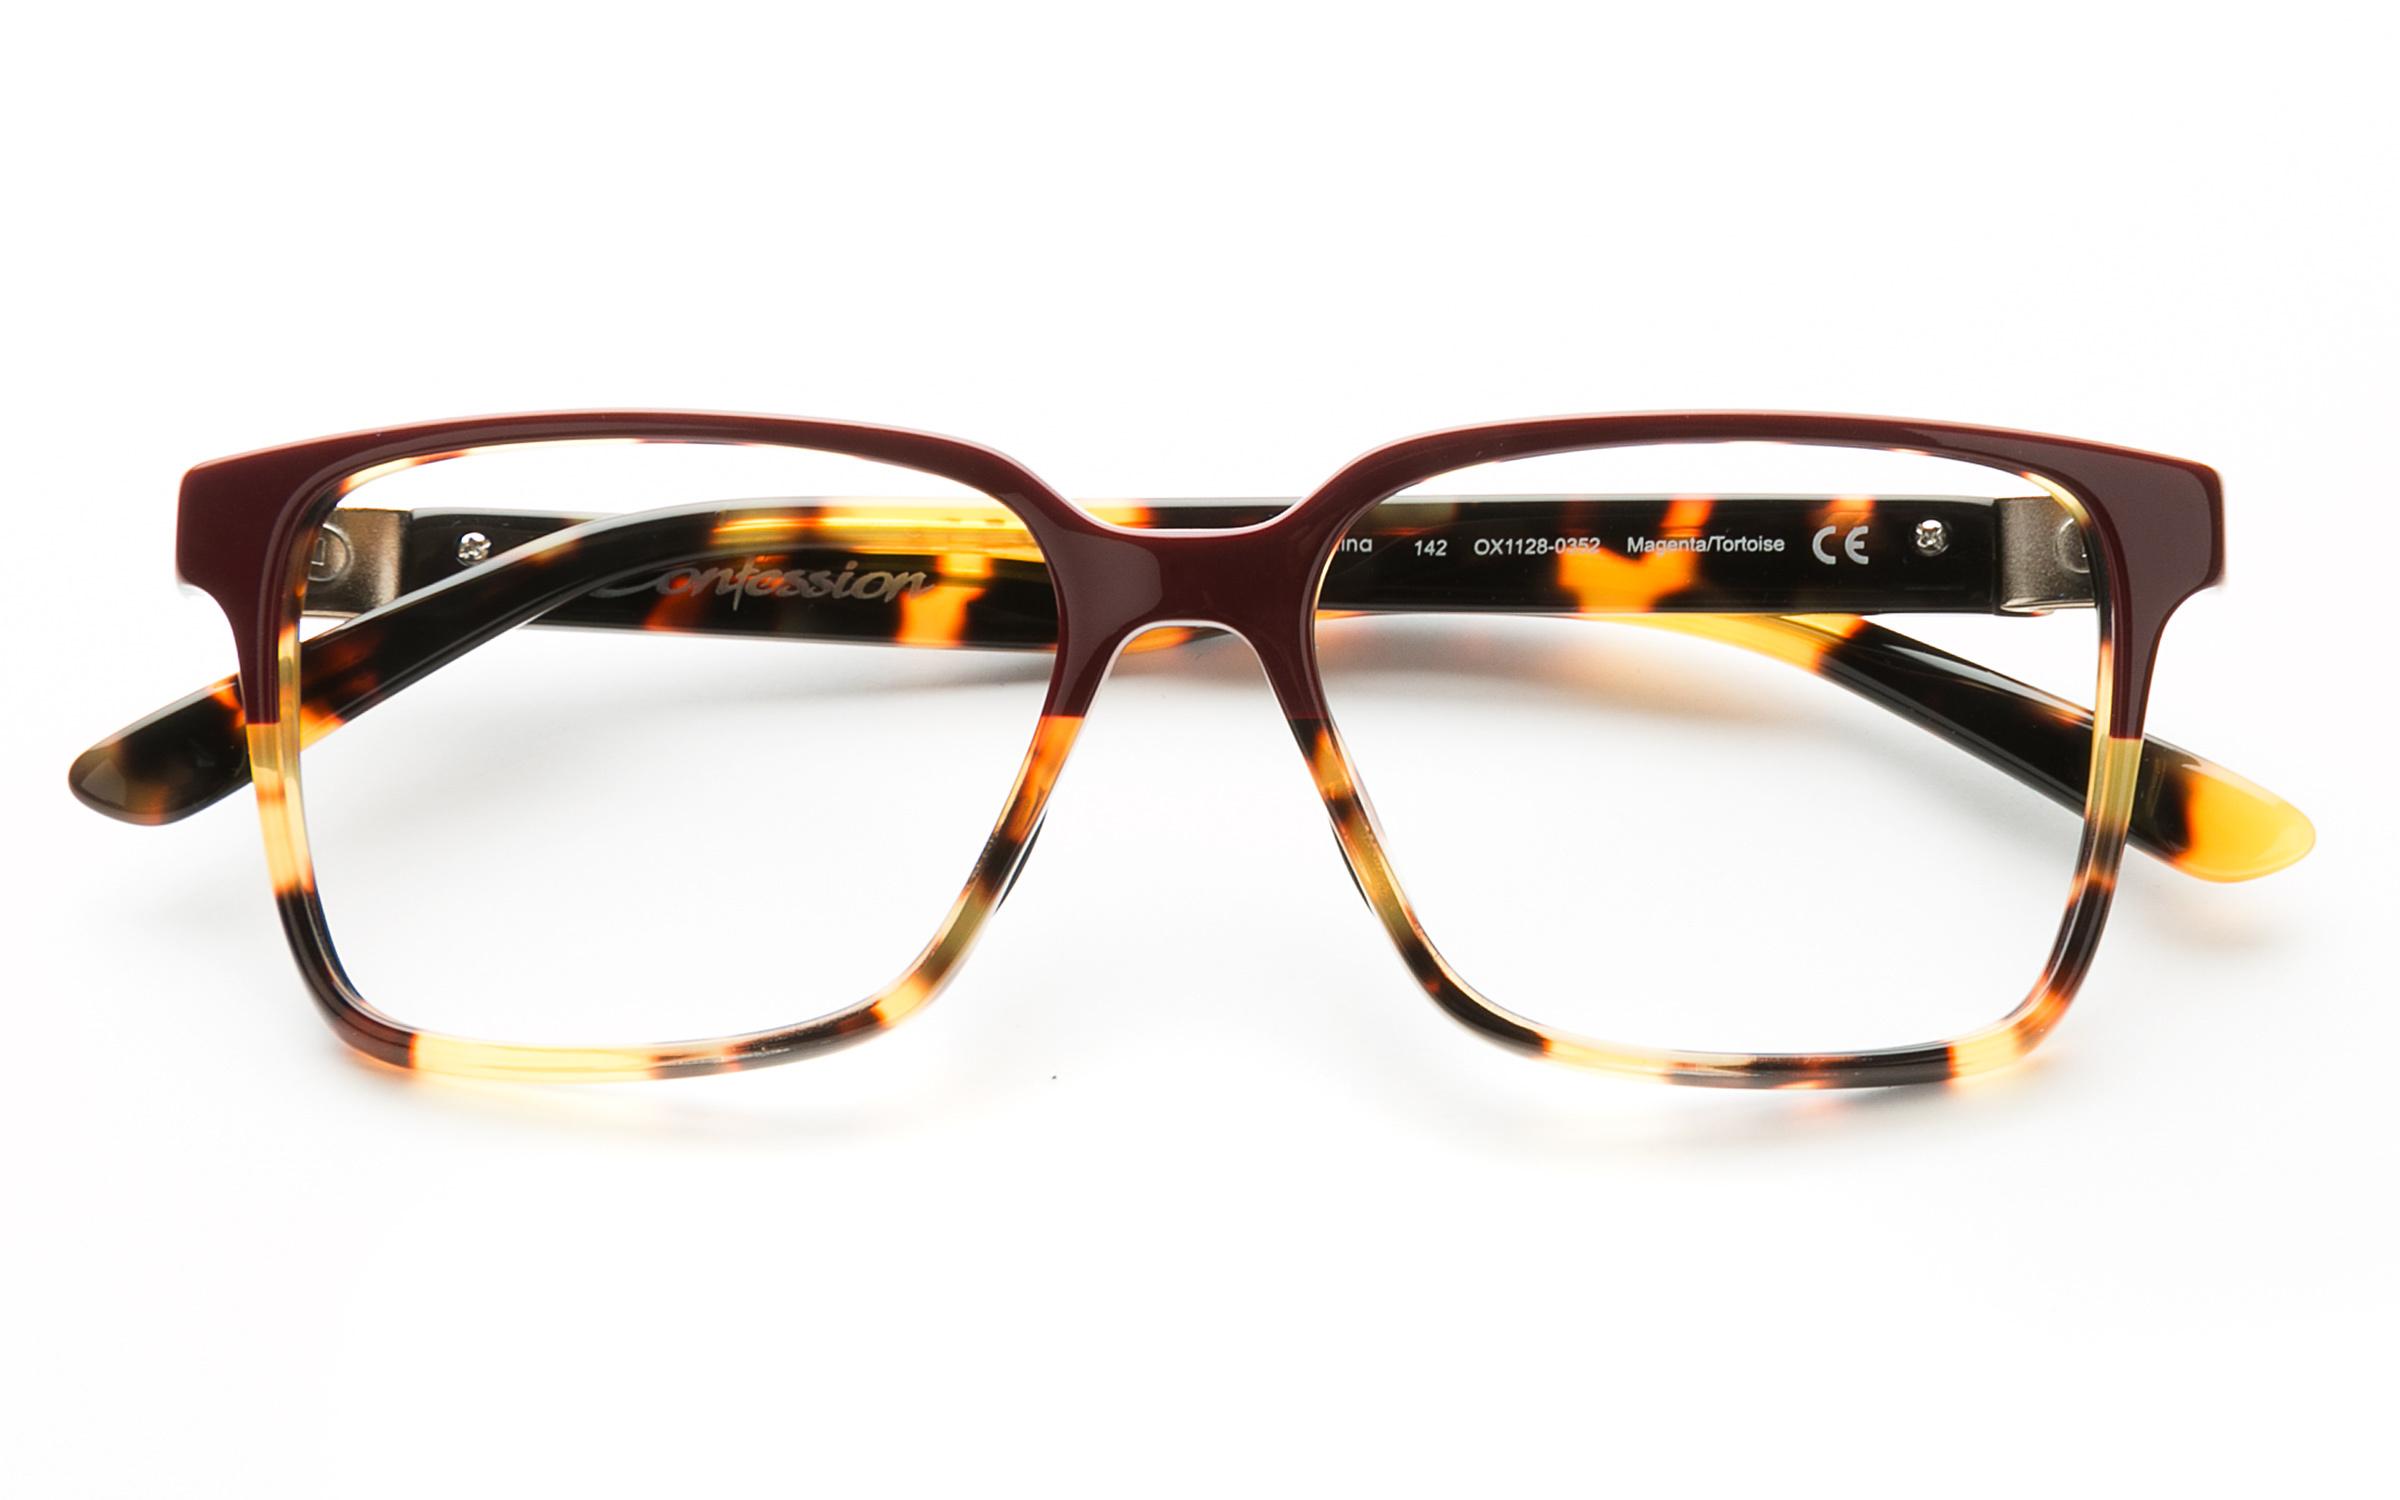 oakley eyewear xbb5  product image of Oakley Confession Magenta Tortoise